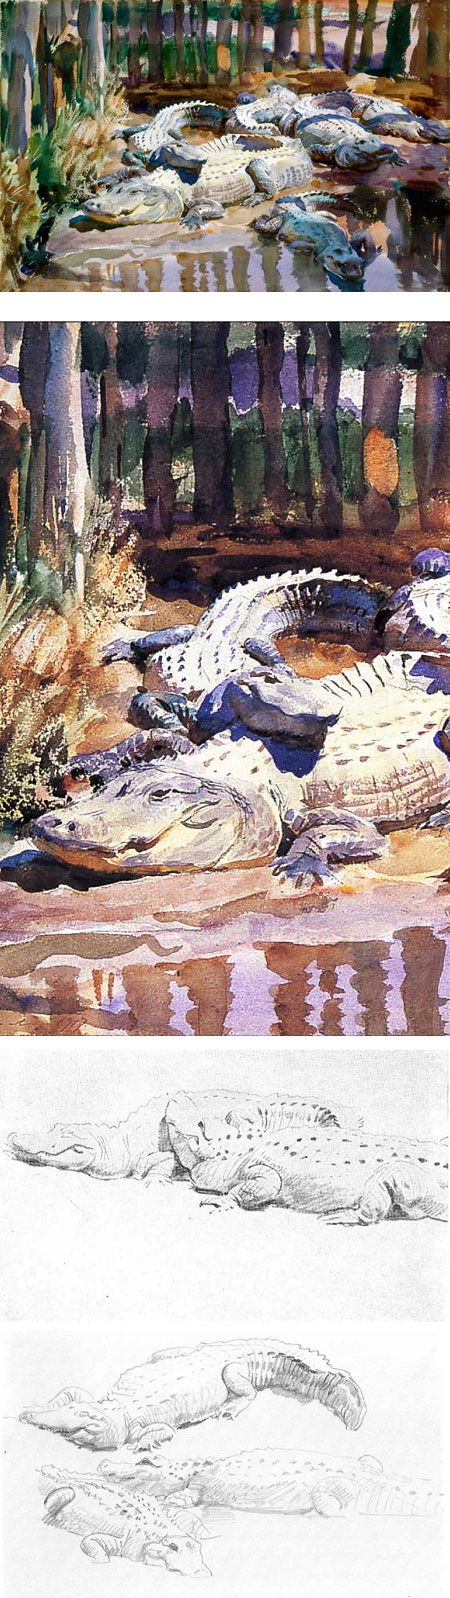 Sargent's Alligators